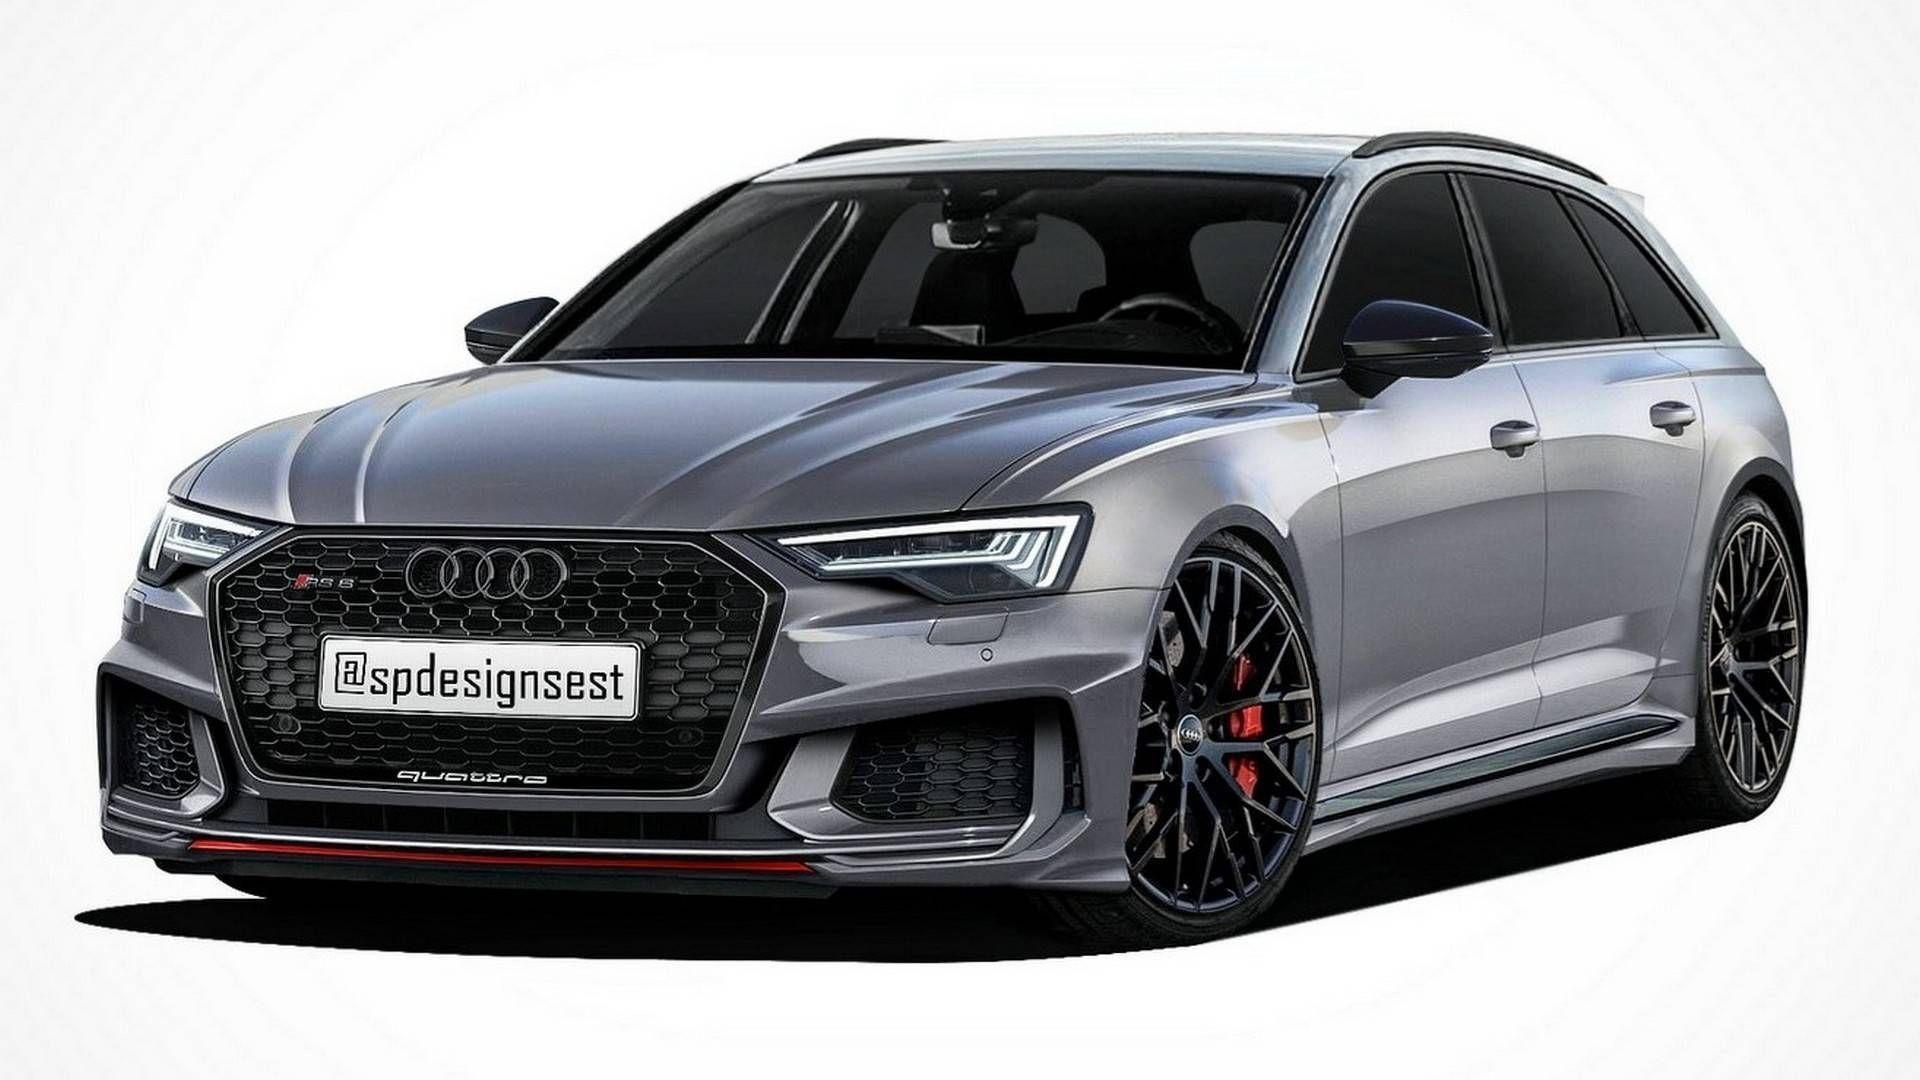 2019 Audi Rs6 Avant Price And Review Motors Audi A6 Avant Audi